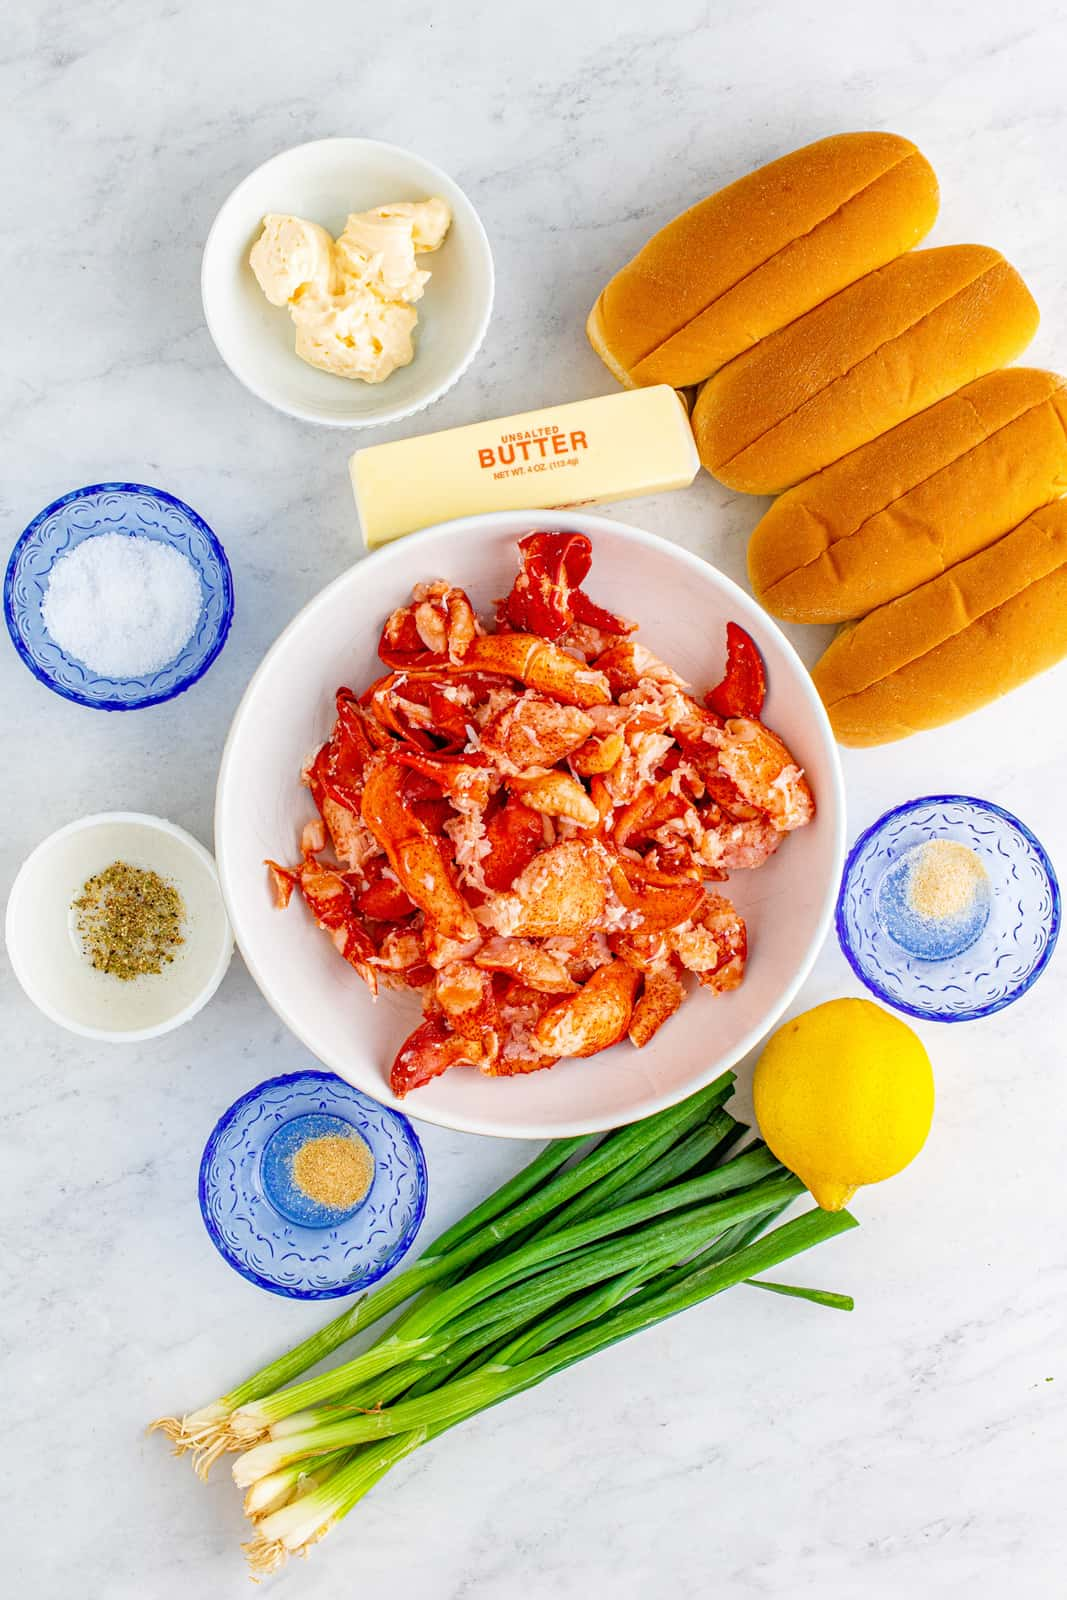 Ingredients needed to make Lobster Rolls